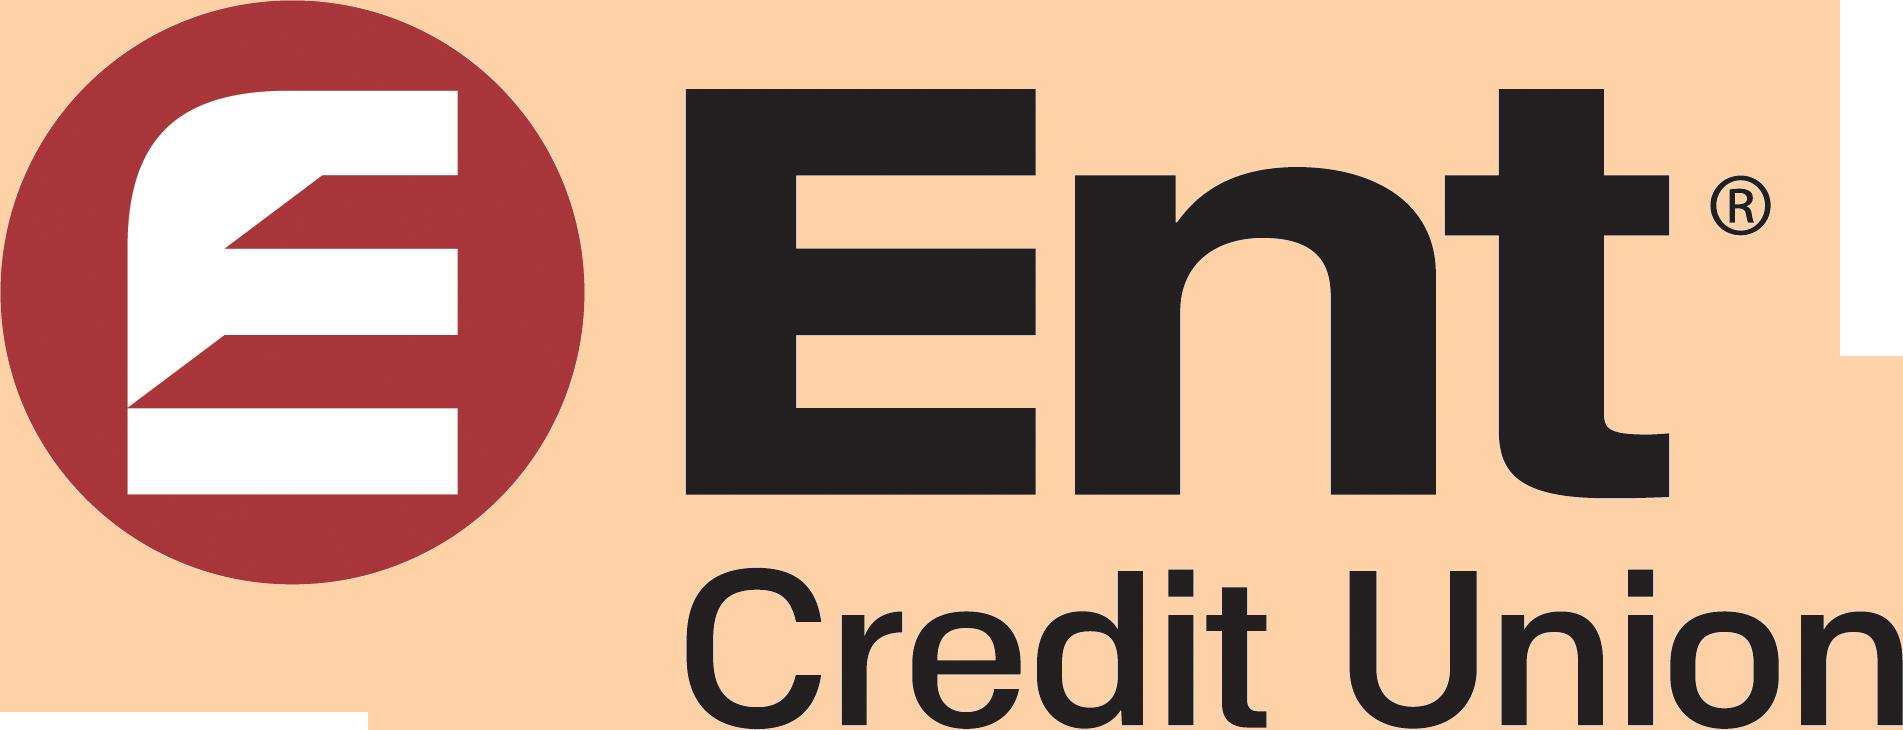 EntCU_Logo_2c (002)- Transparent